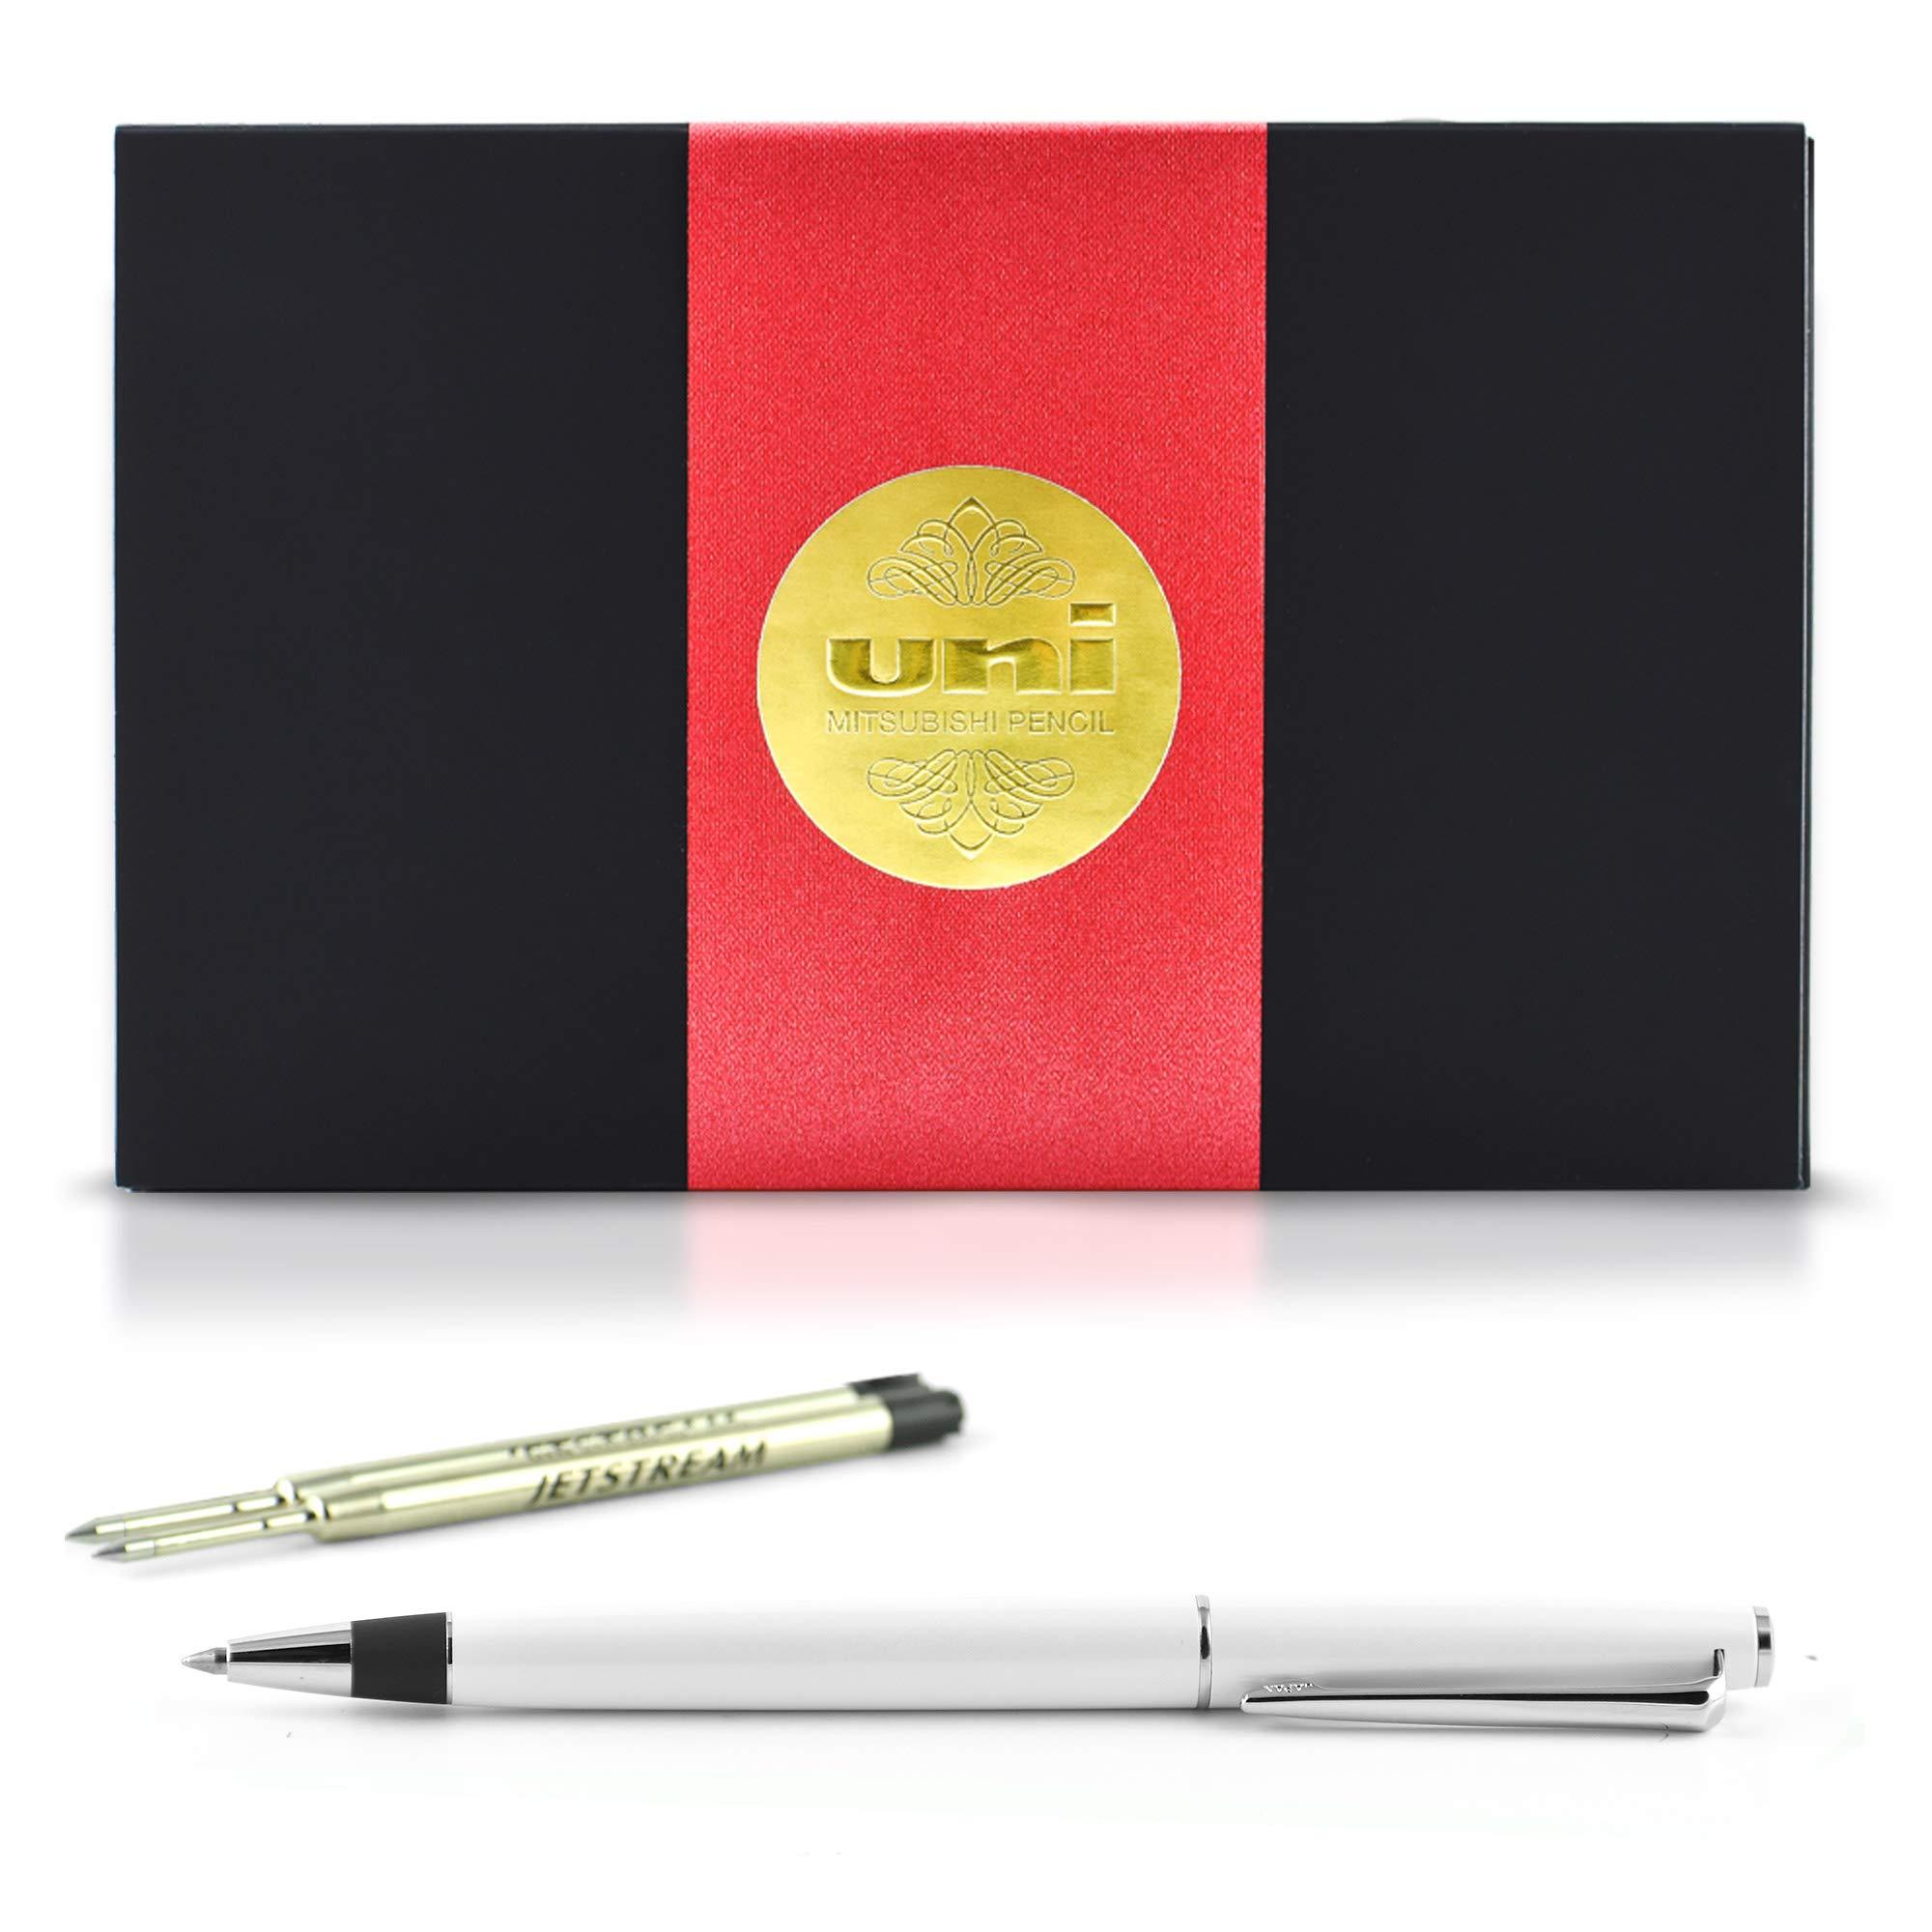 uni JETSTREAM PRIME TWIST - Includes one pen + two Parker Style refills (SXR-600-07) in Exclusive uni Gift Box (Pearl White)